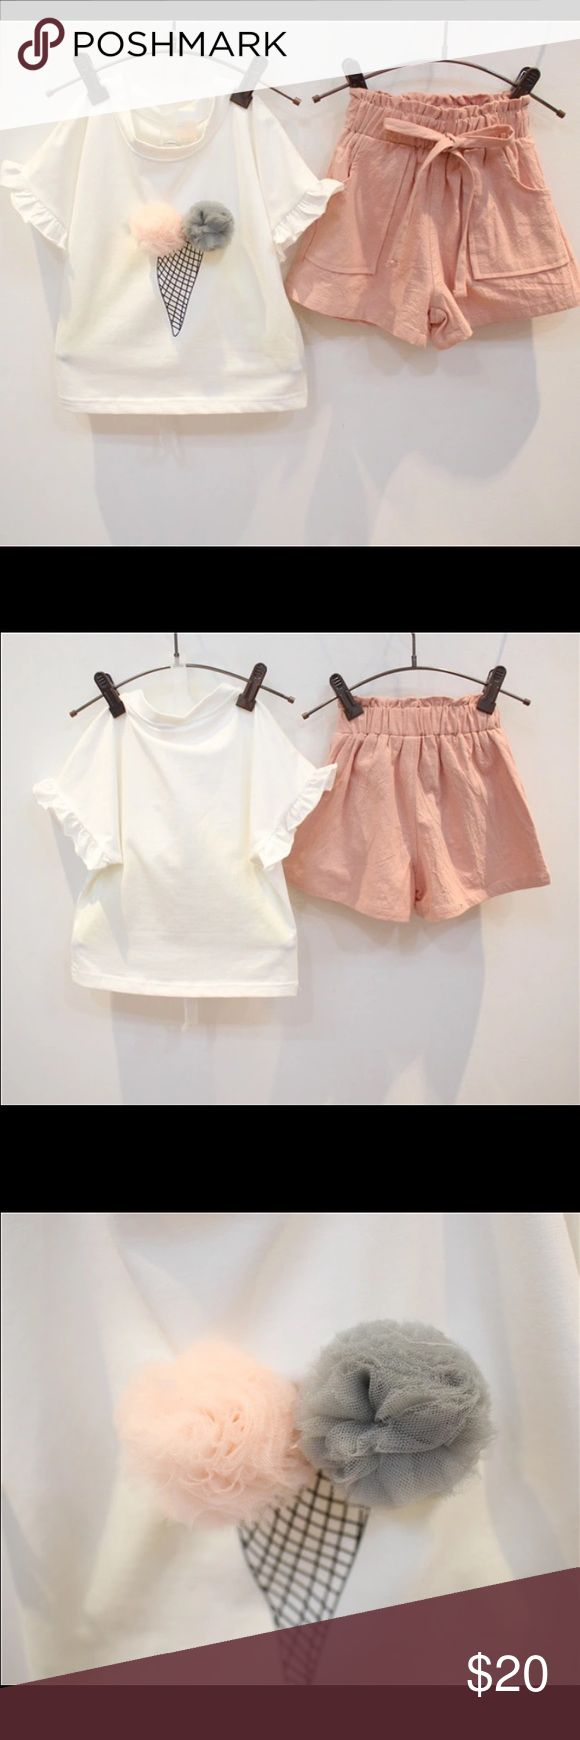 Ice Cream tee & Short Set Ice Cream tshirt with a linen short. Matching Sets